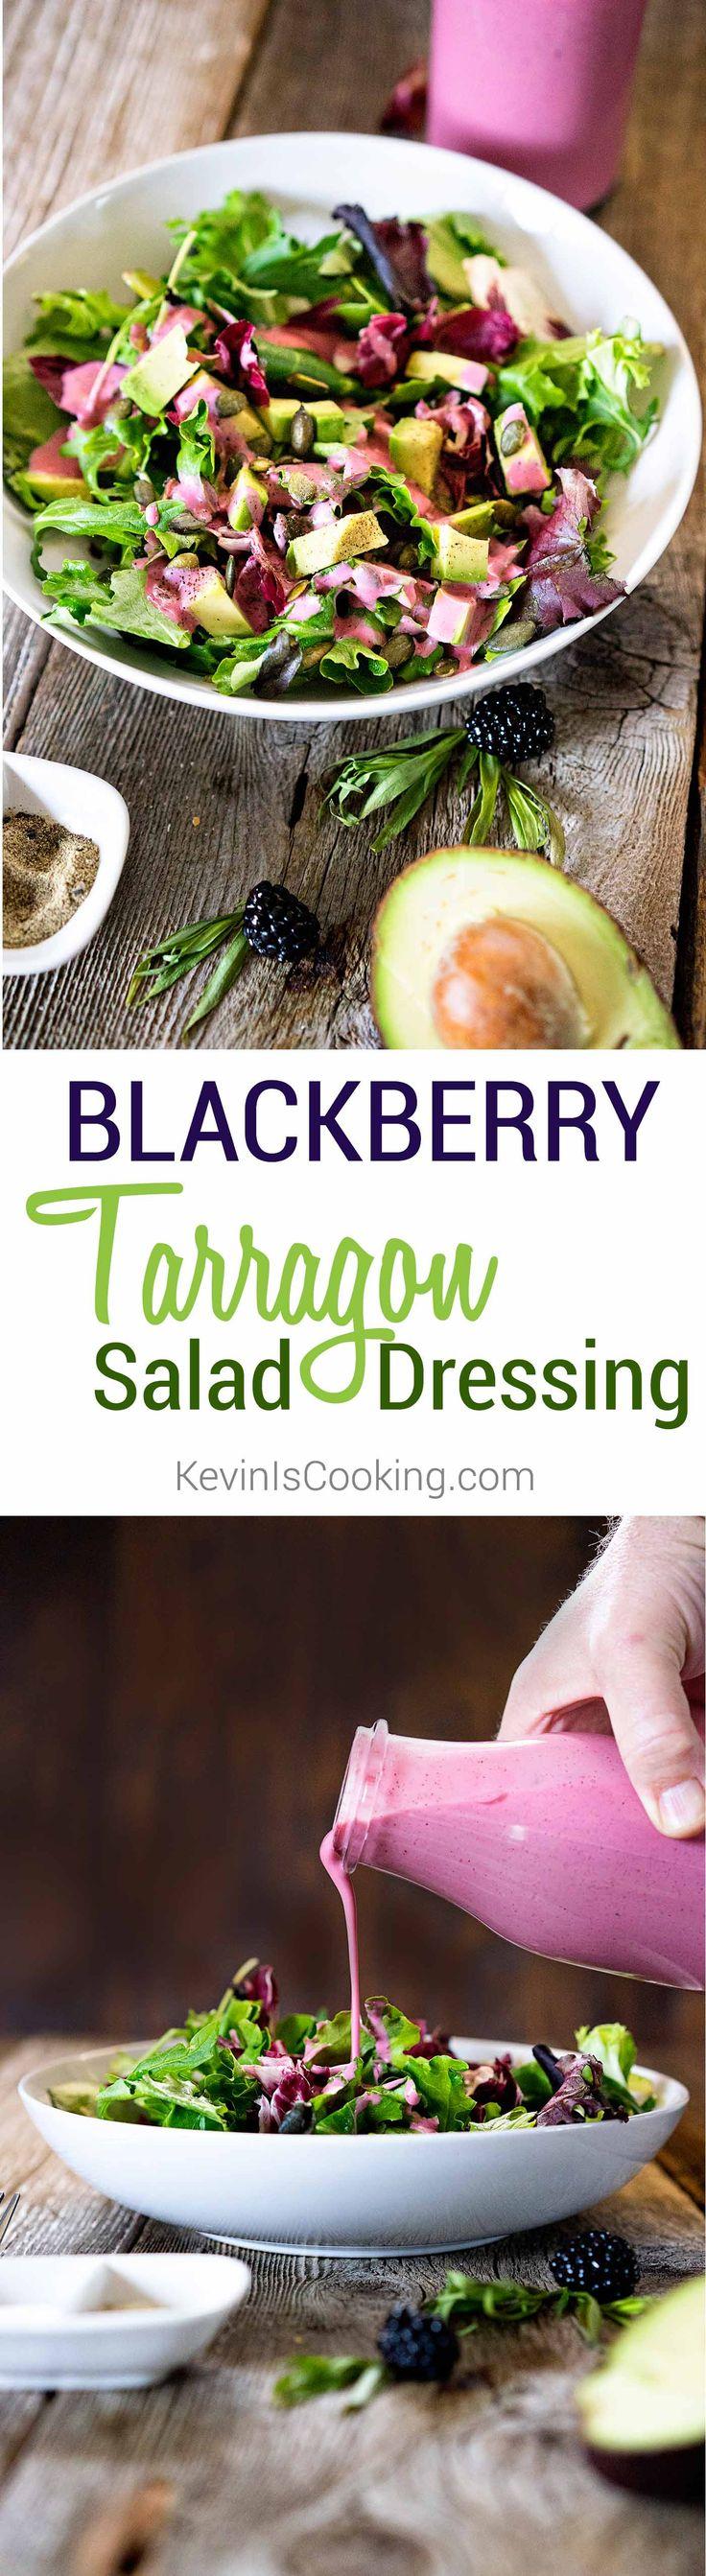 Blackberry Tarragon Salad Dressing. .